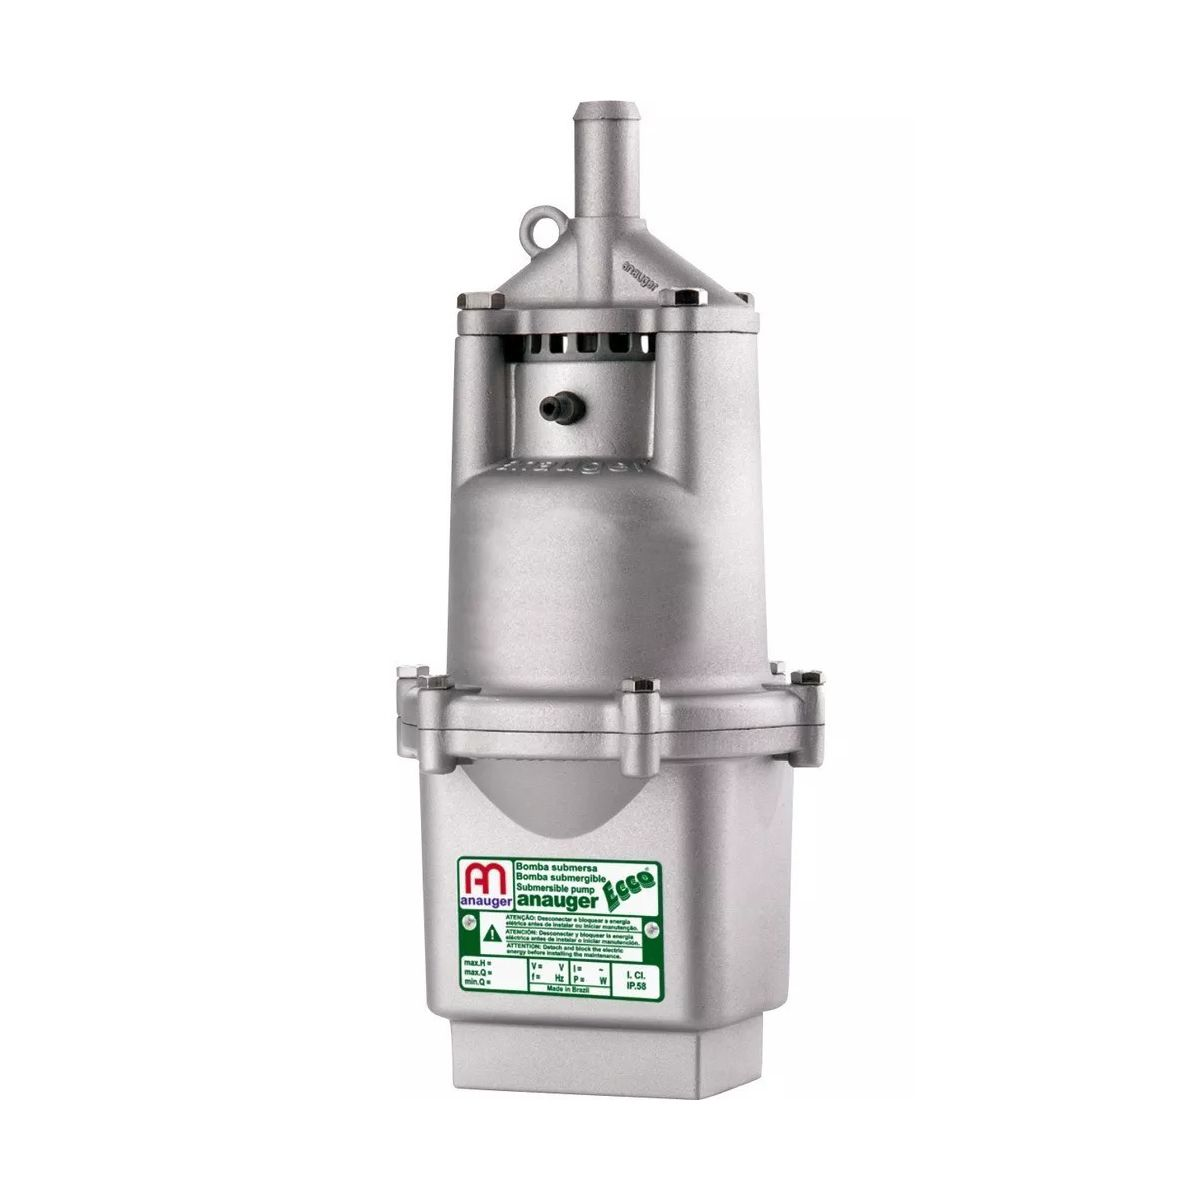 Bomba Submersa Anauger Ecco para poço Potência de 300 Watts 110V